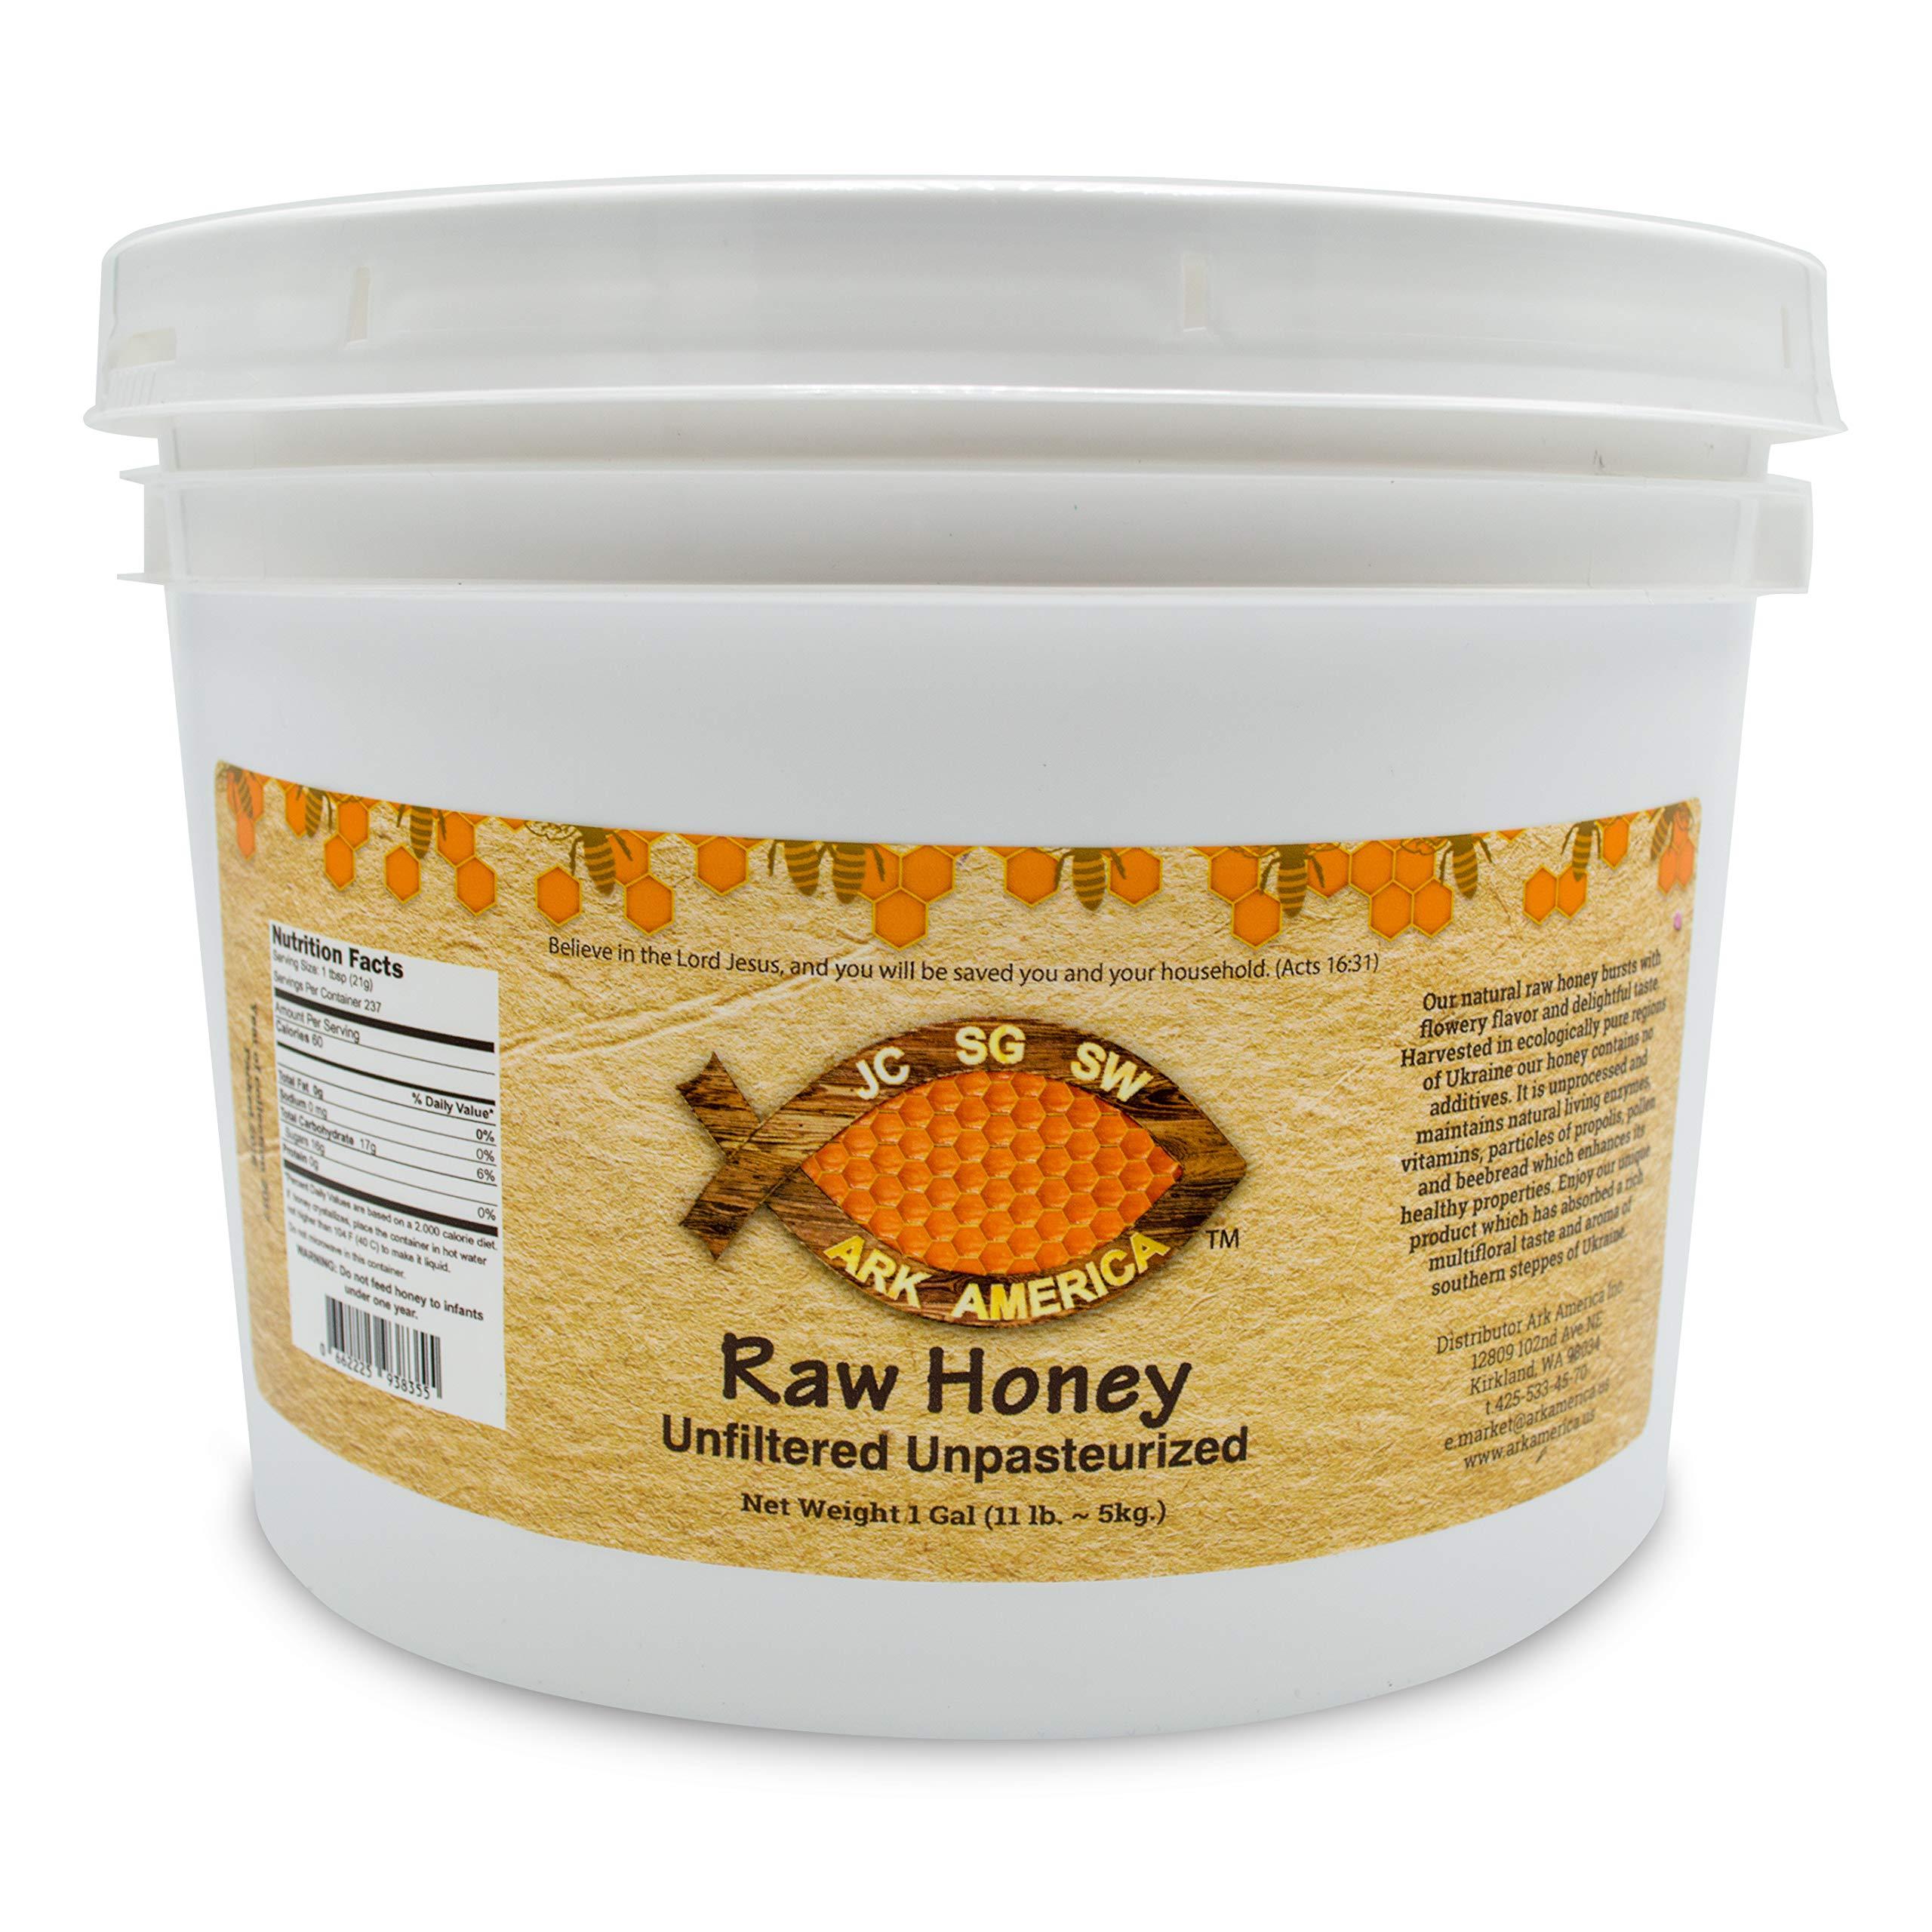 Ark America Raw Honey, Unfiltered, Unpasteurized (1 gallon)